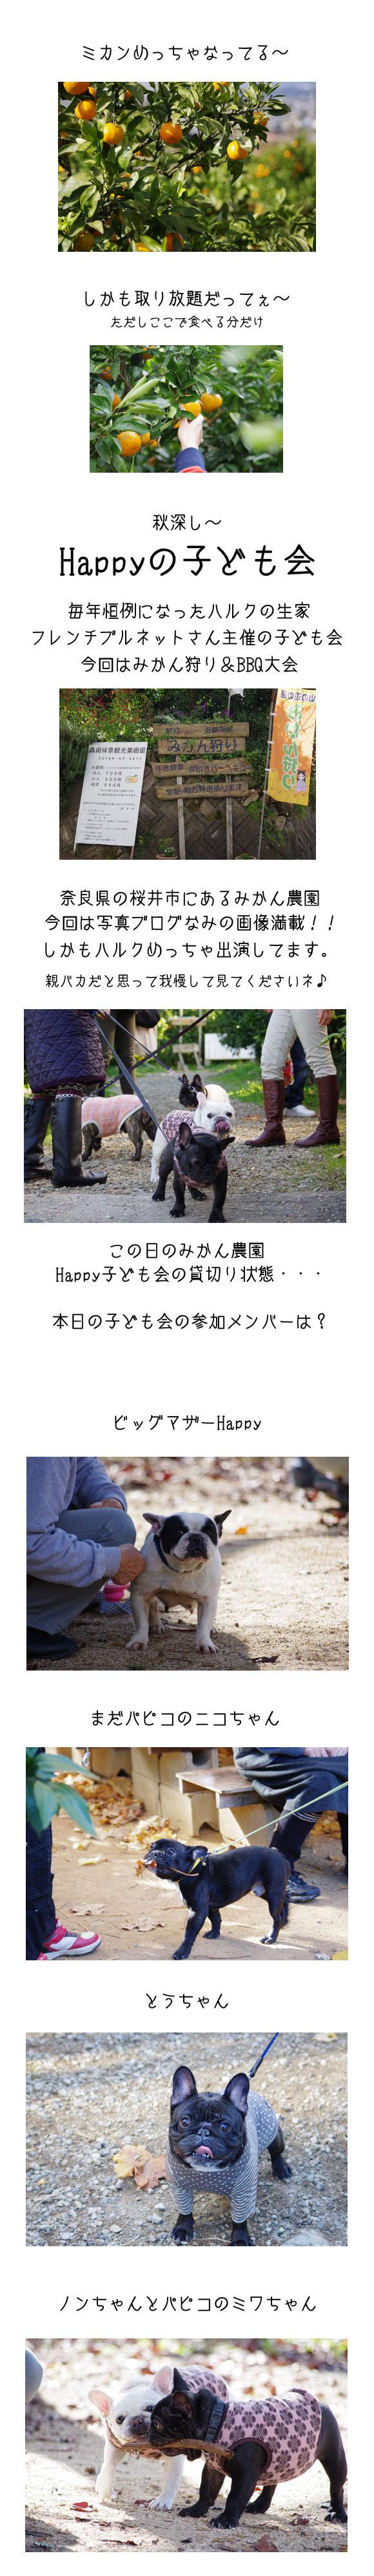 Happy子どもの会♪